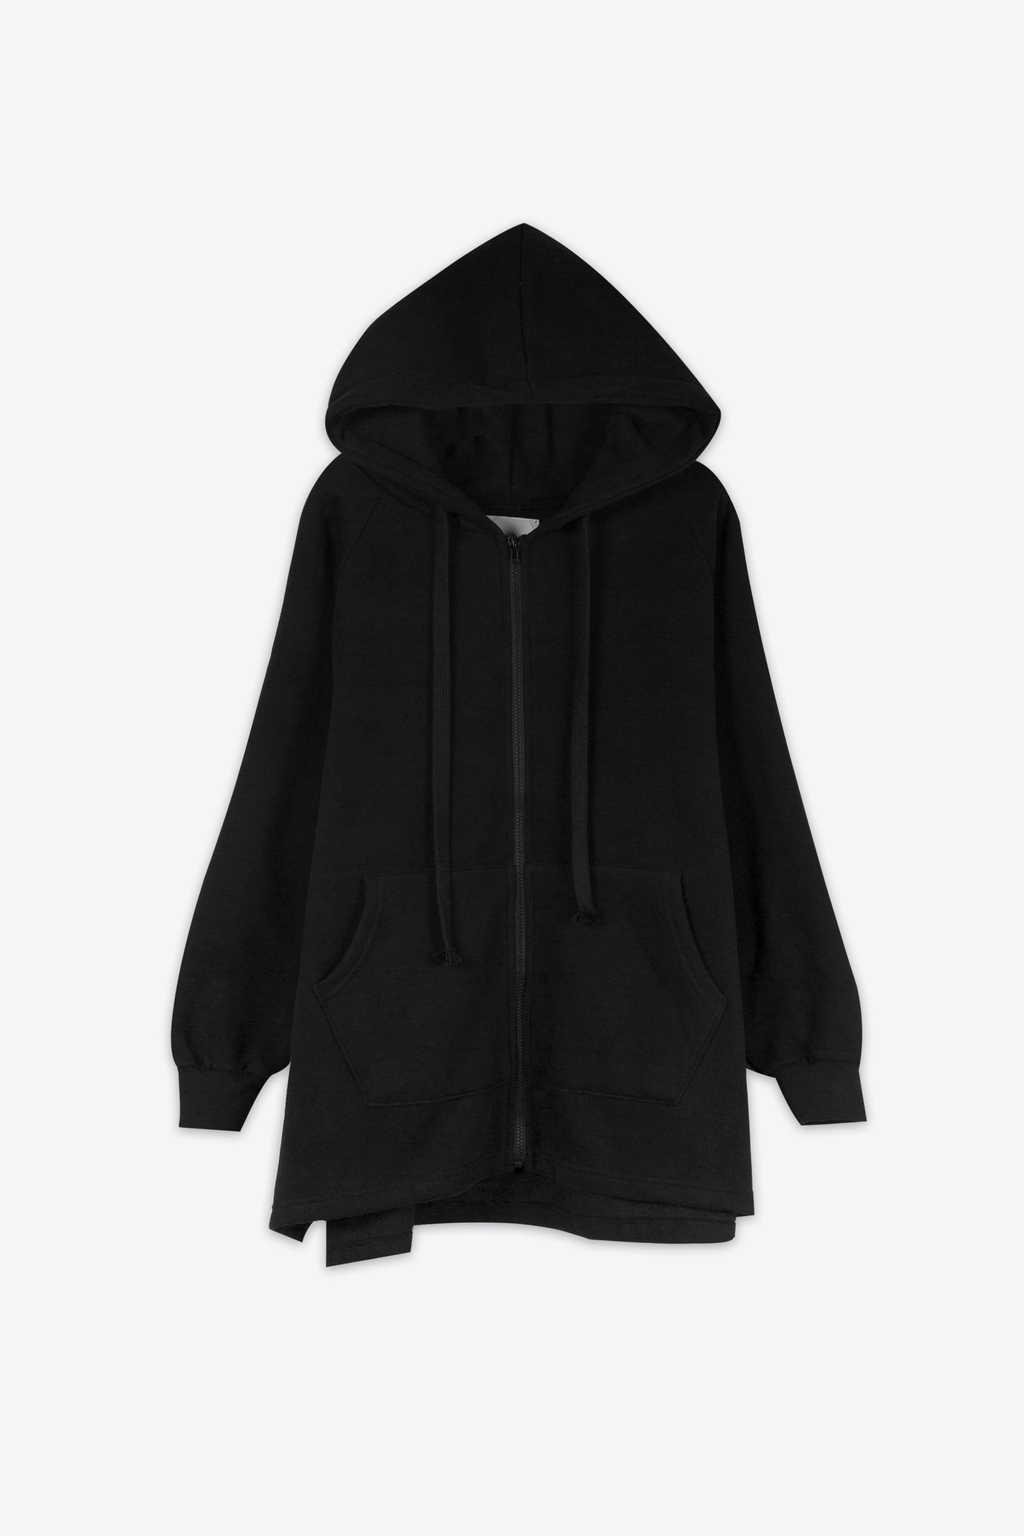 Jacket G45 Black 5